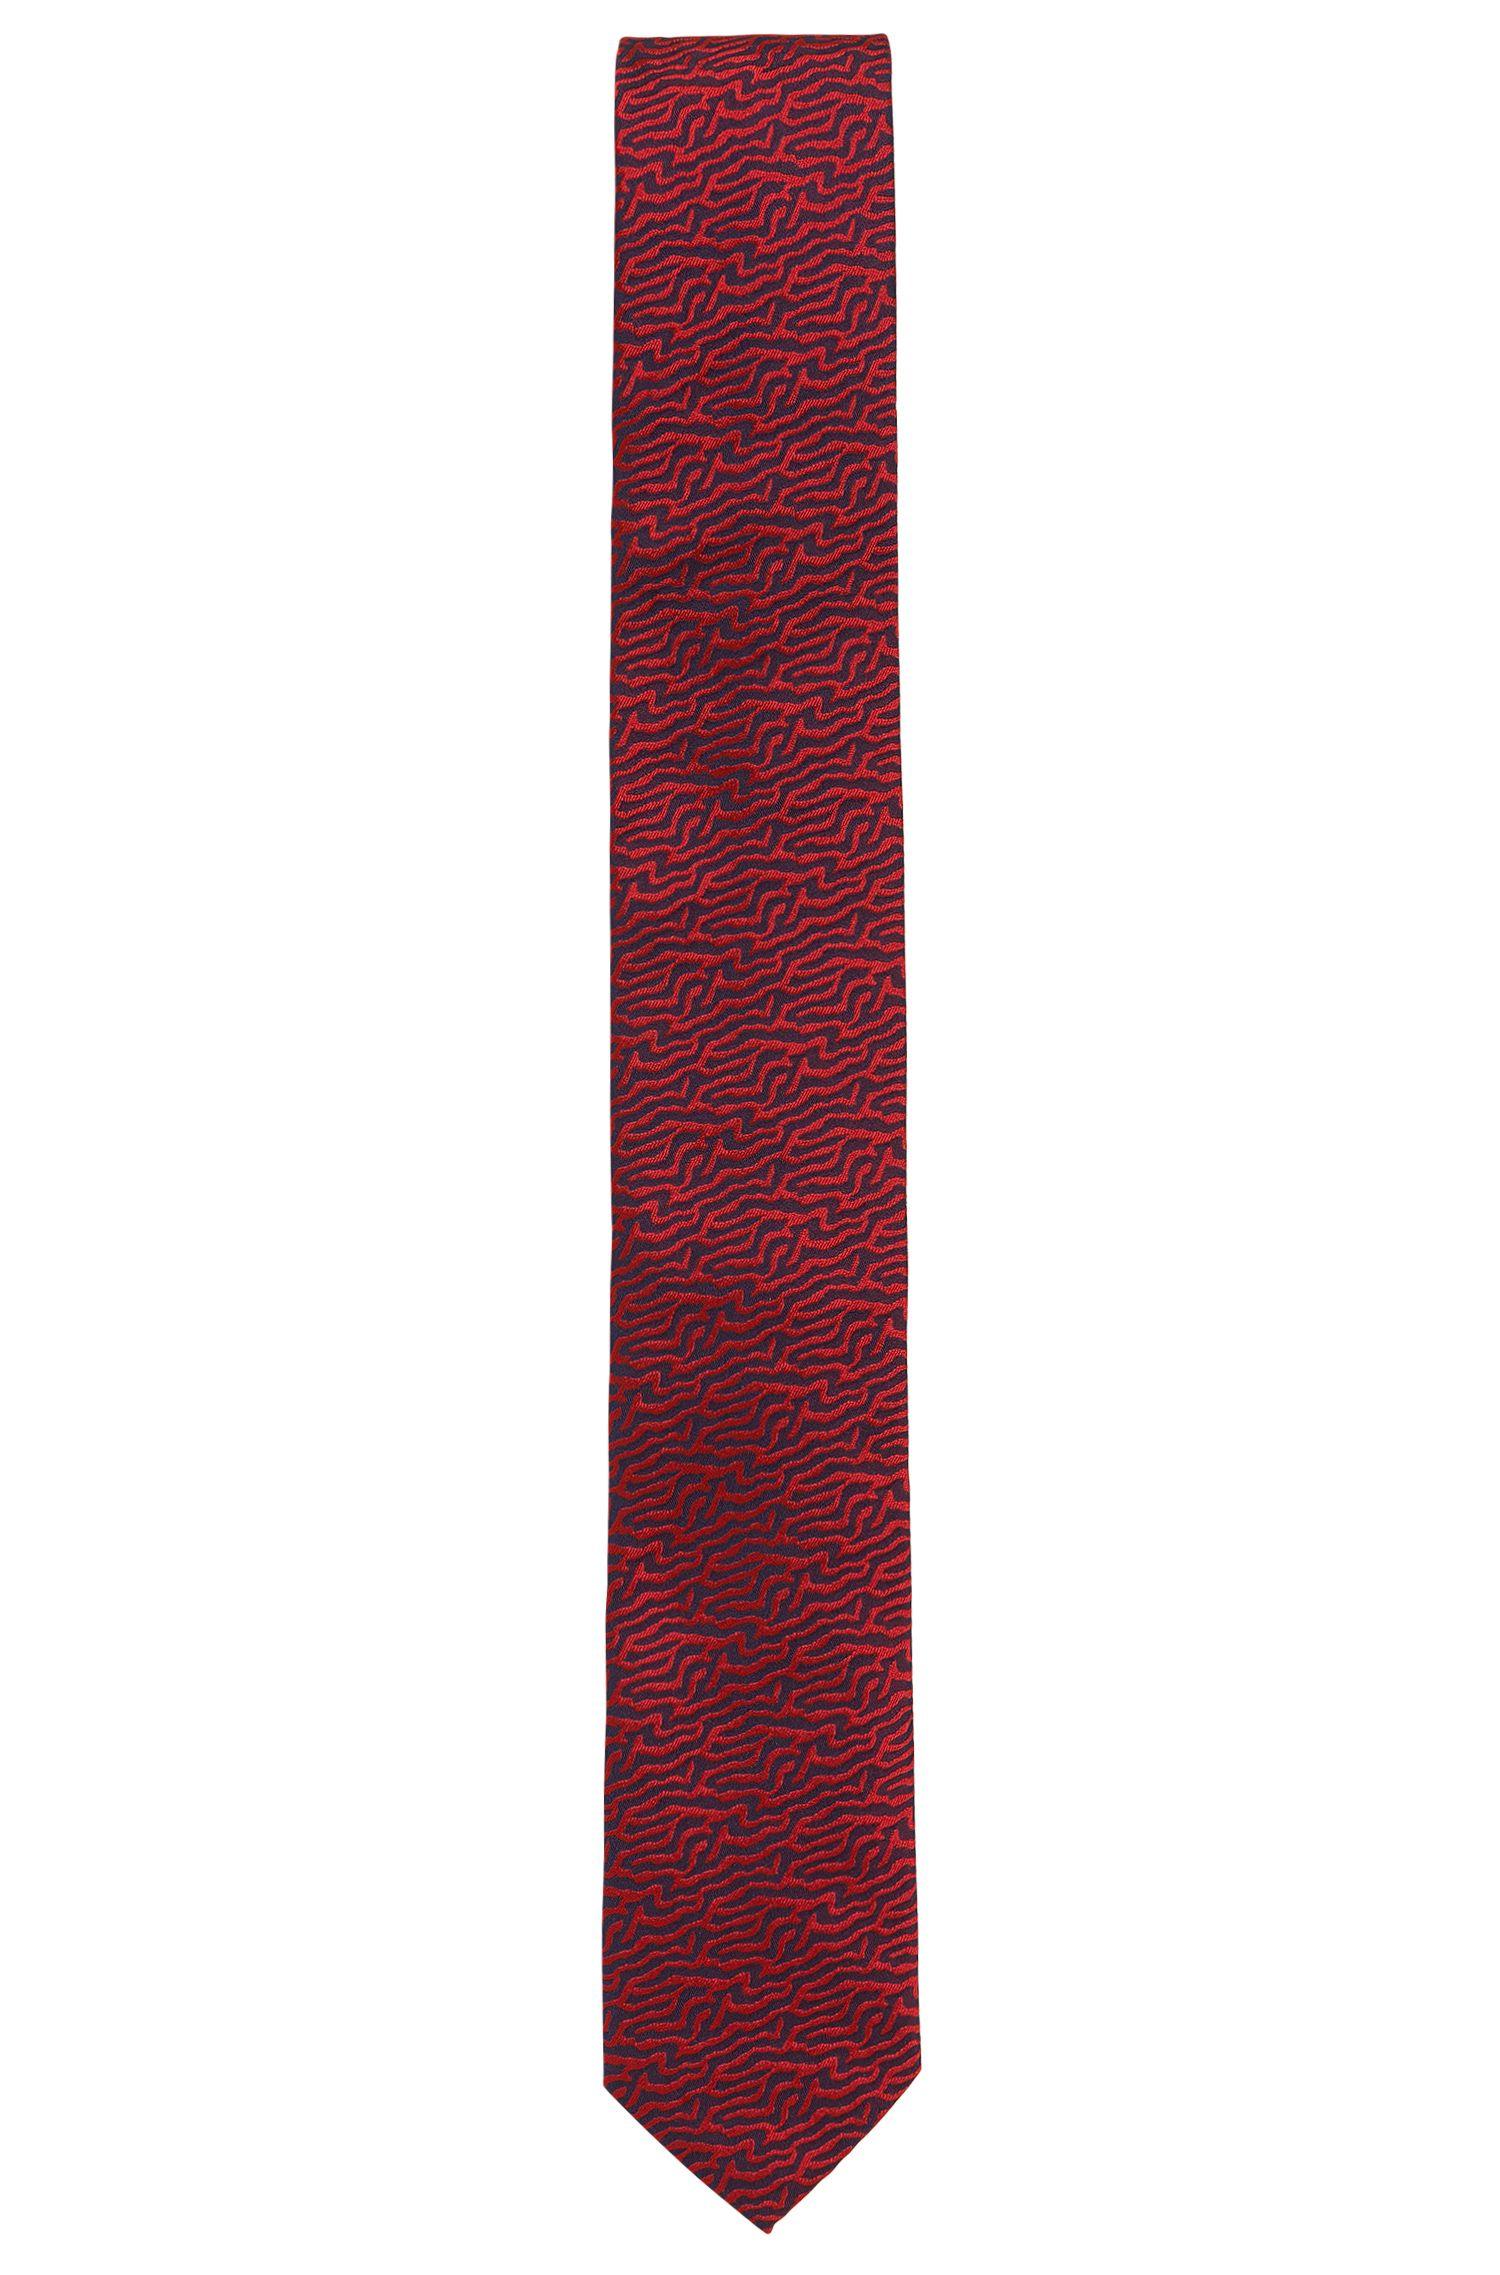 Cravatta jacquard in seta pregiata